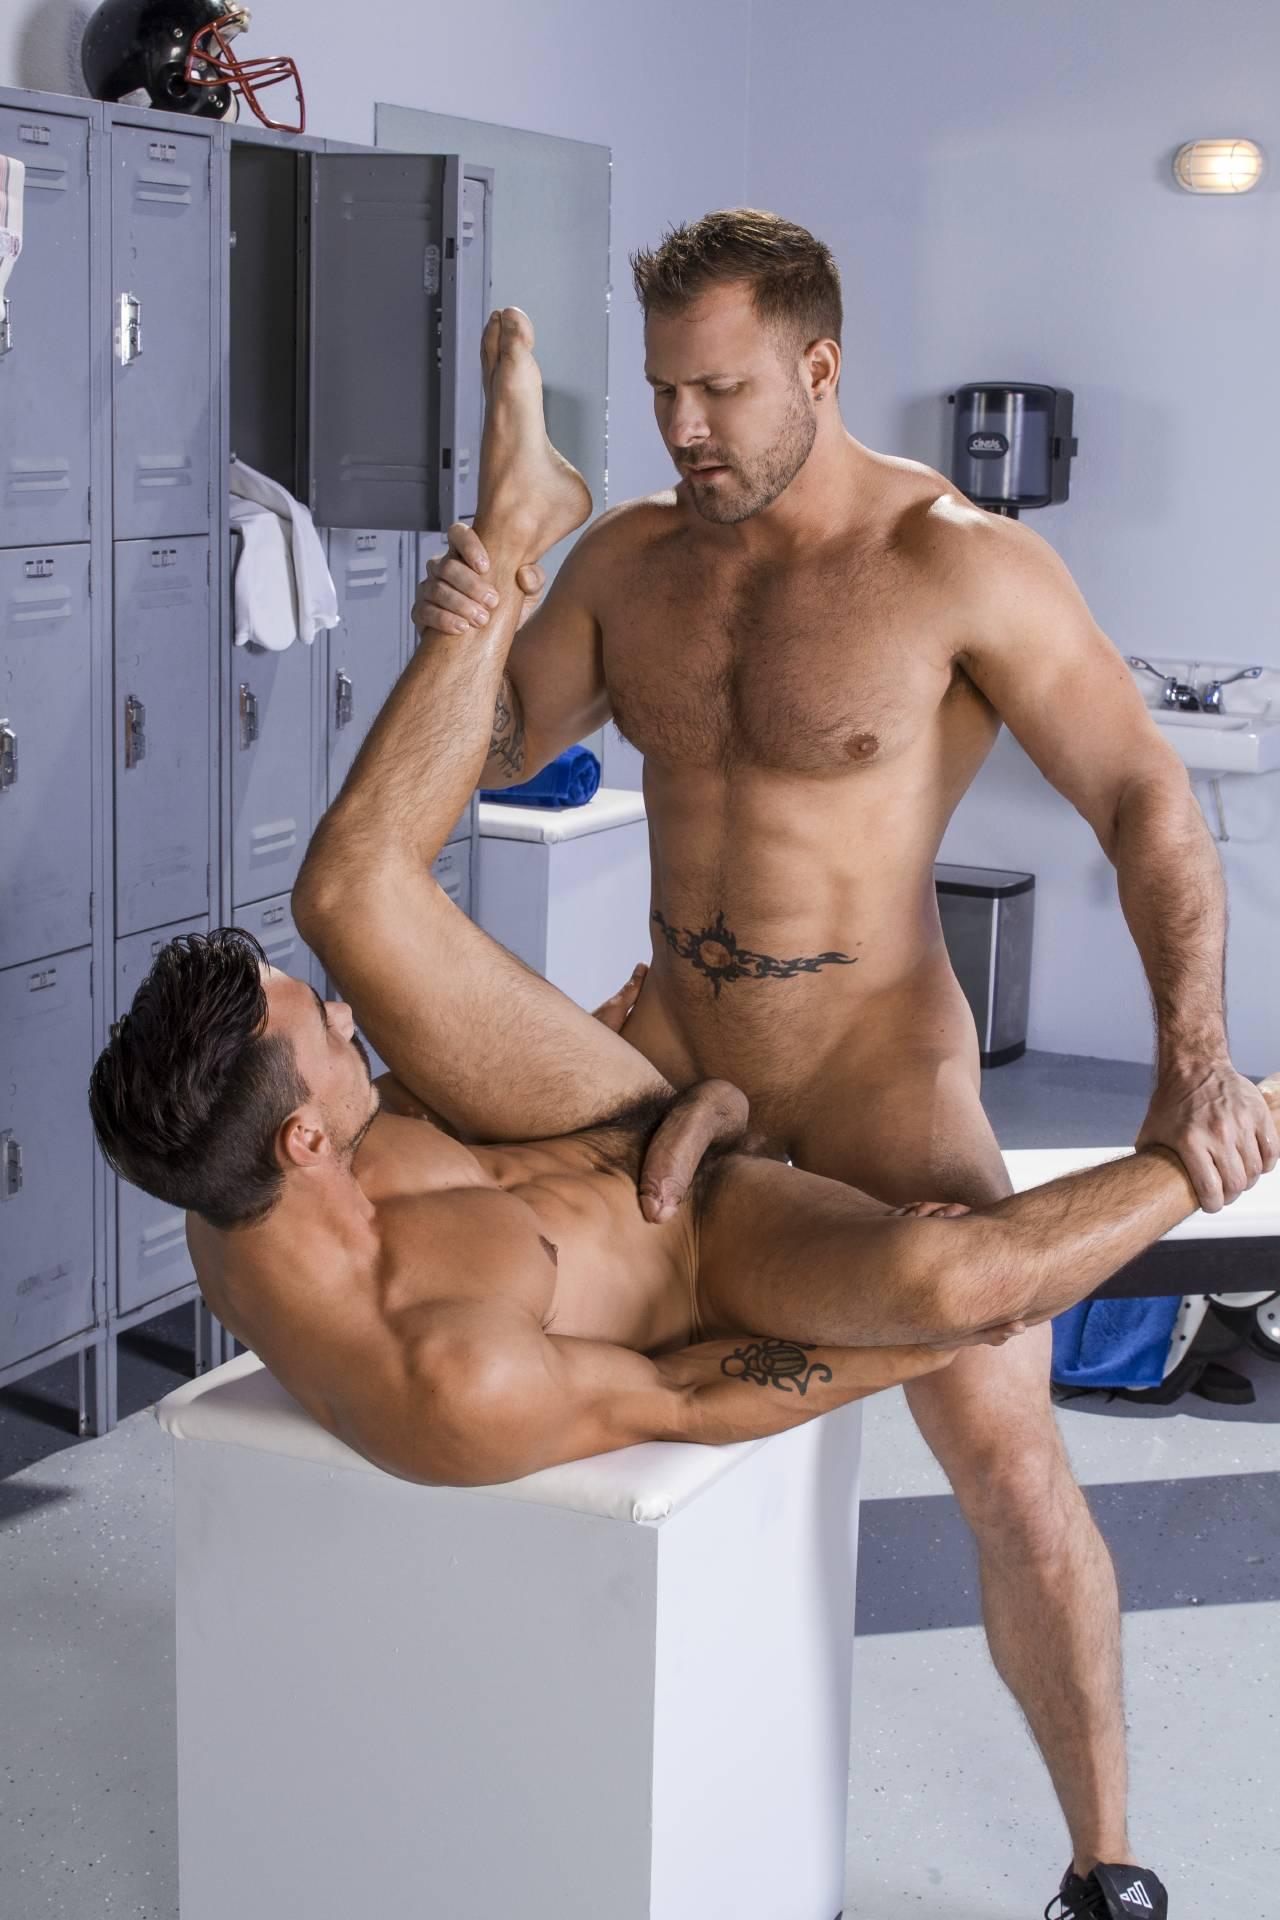 raunchy gay men into piss videos